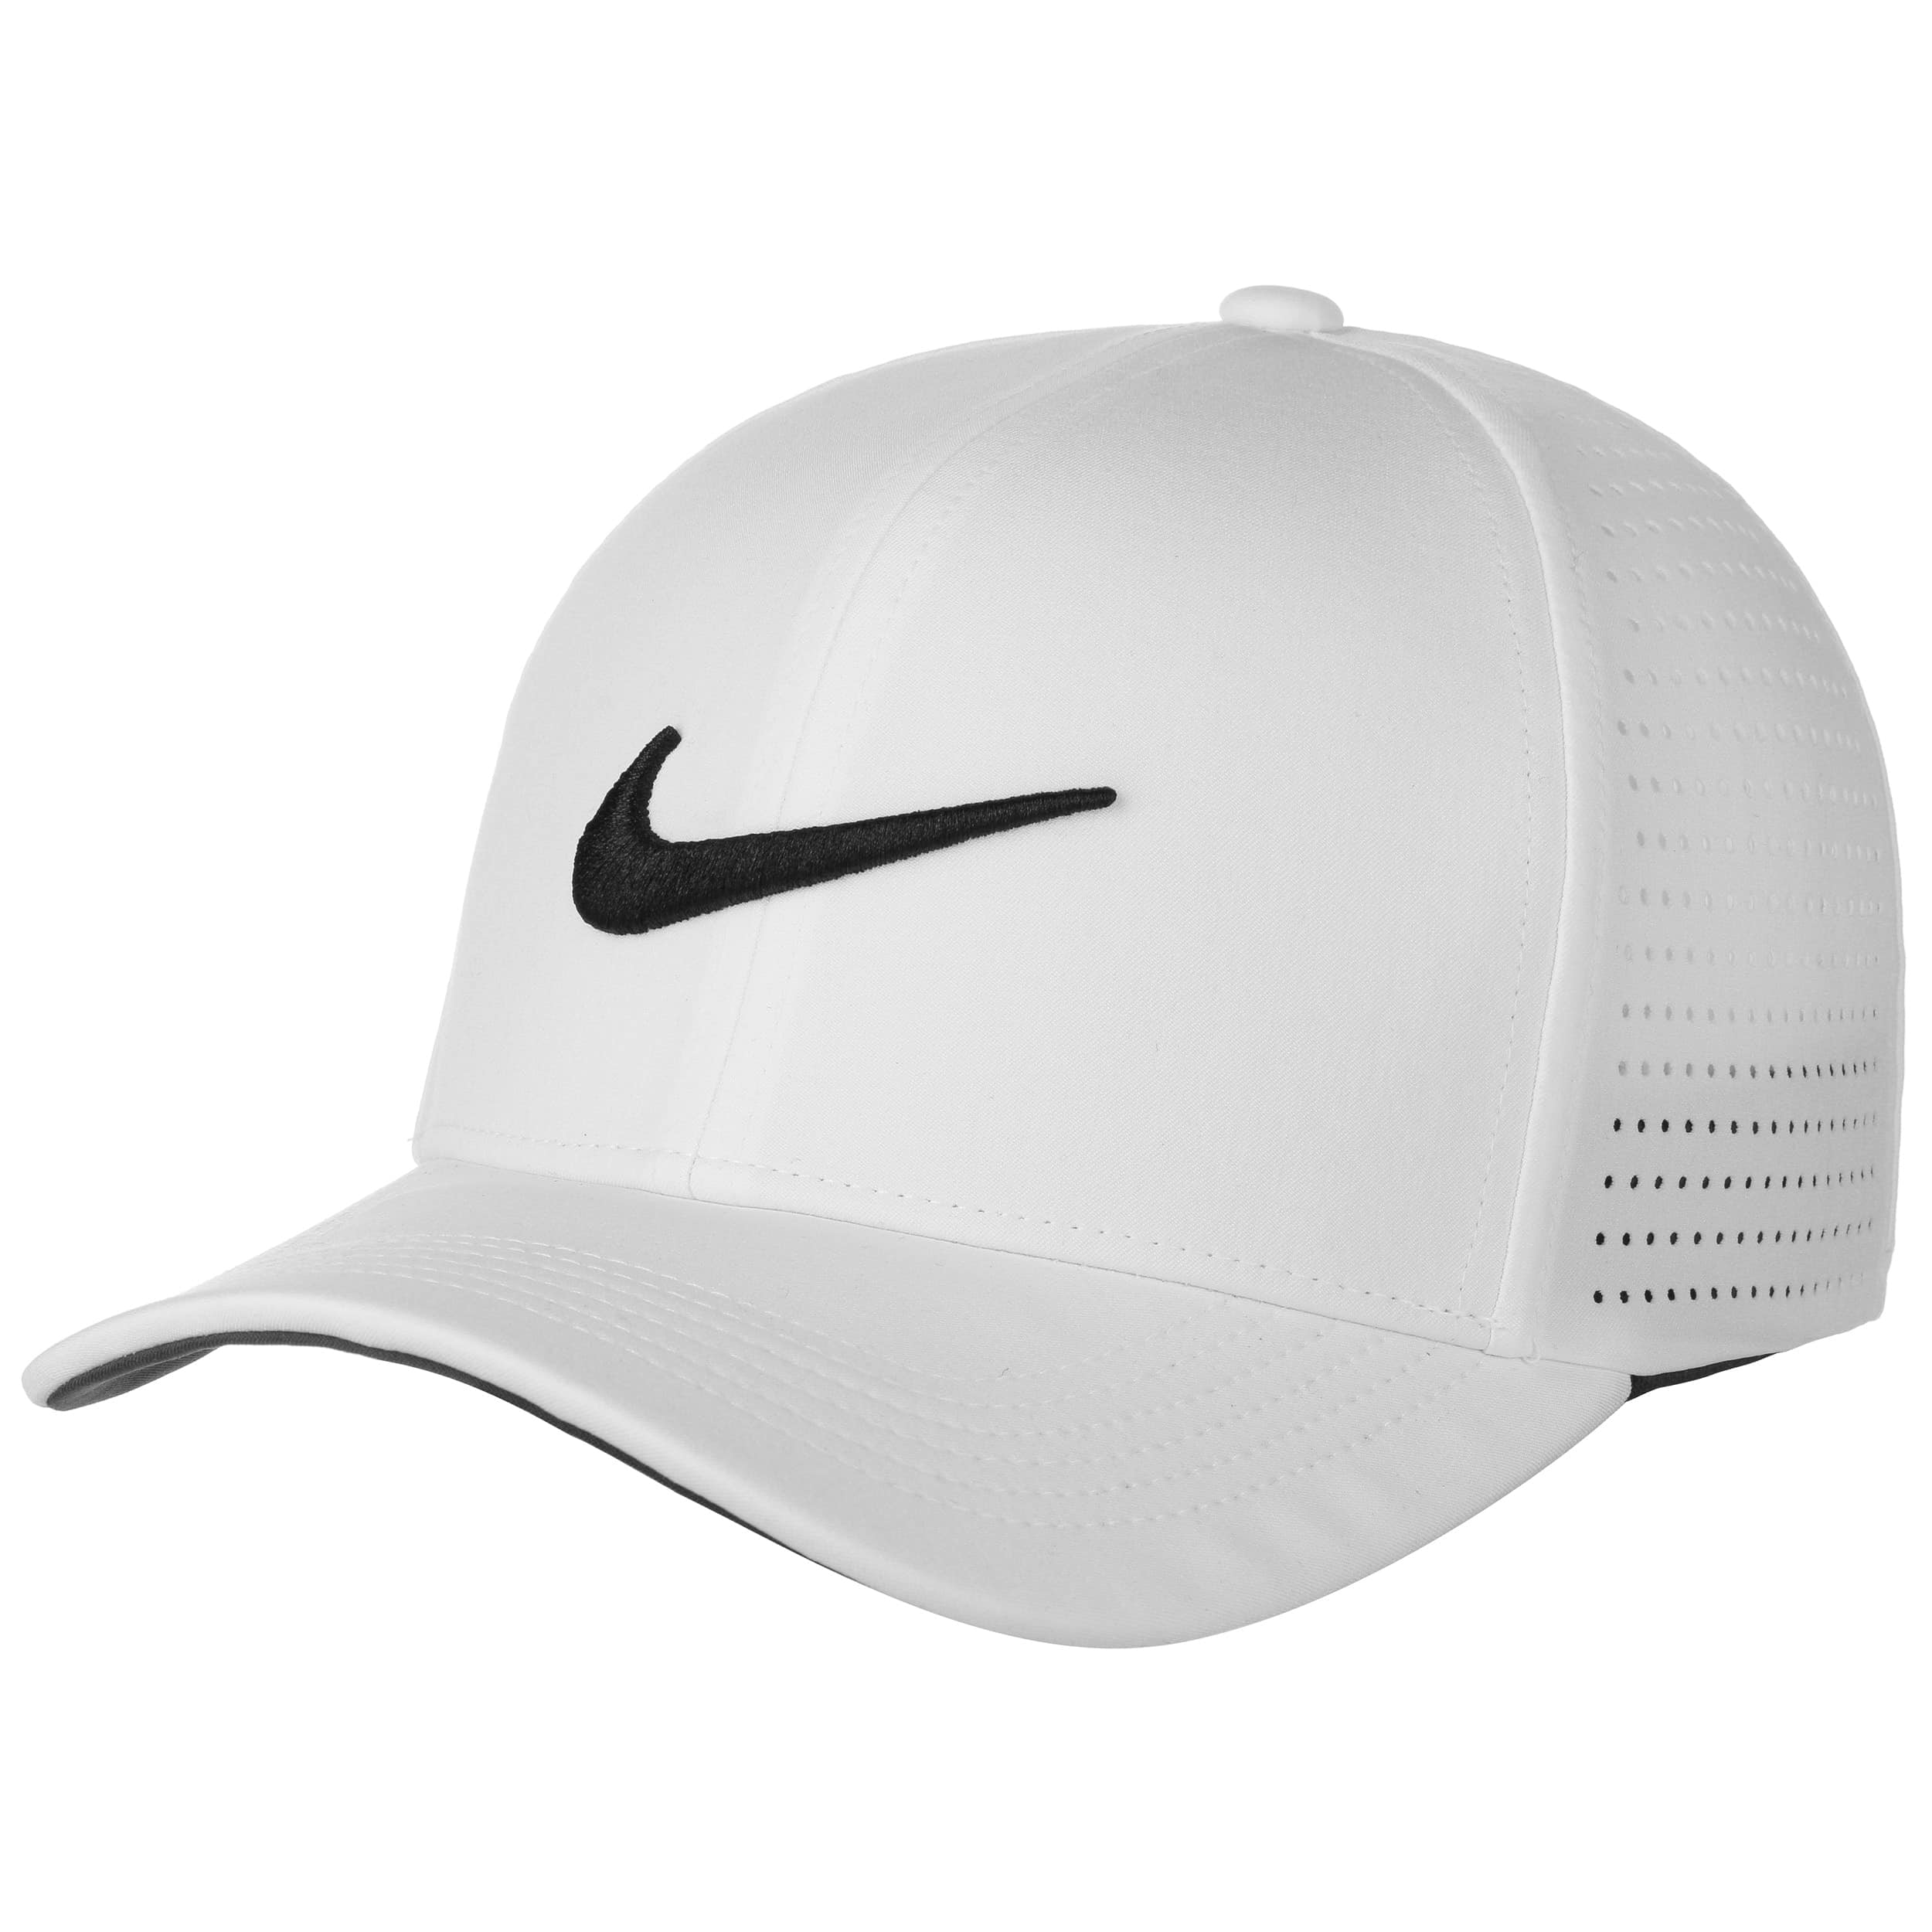 81dcfa83d286c Gorra Golf Classic 99 Baseball by Nike - Gorras - sombreroshop.es